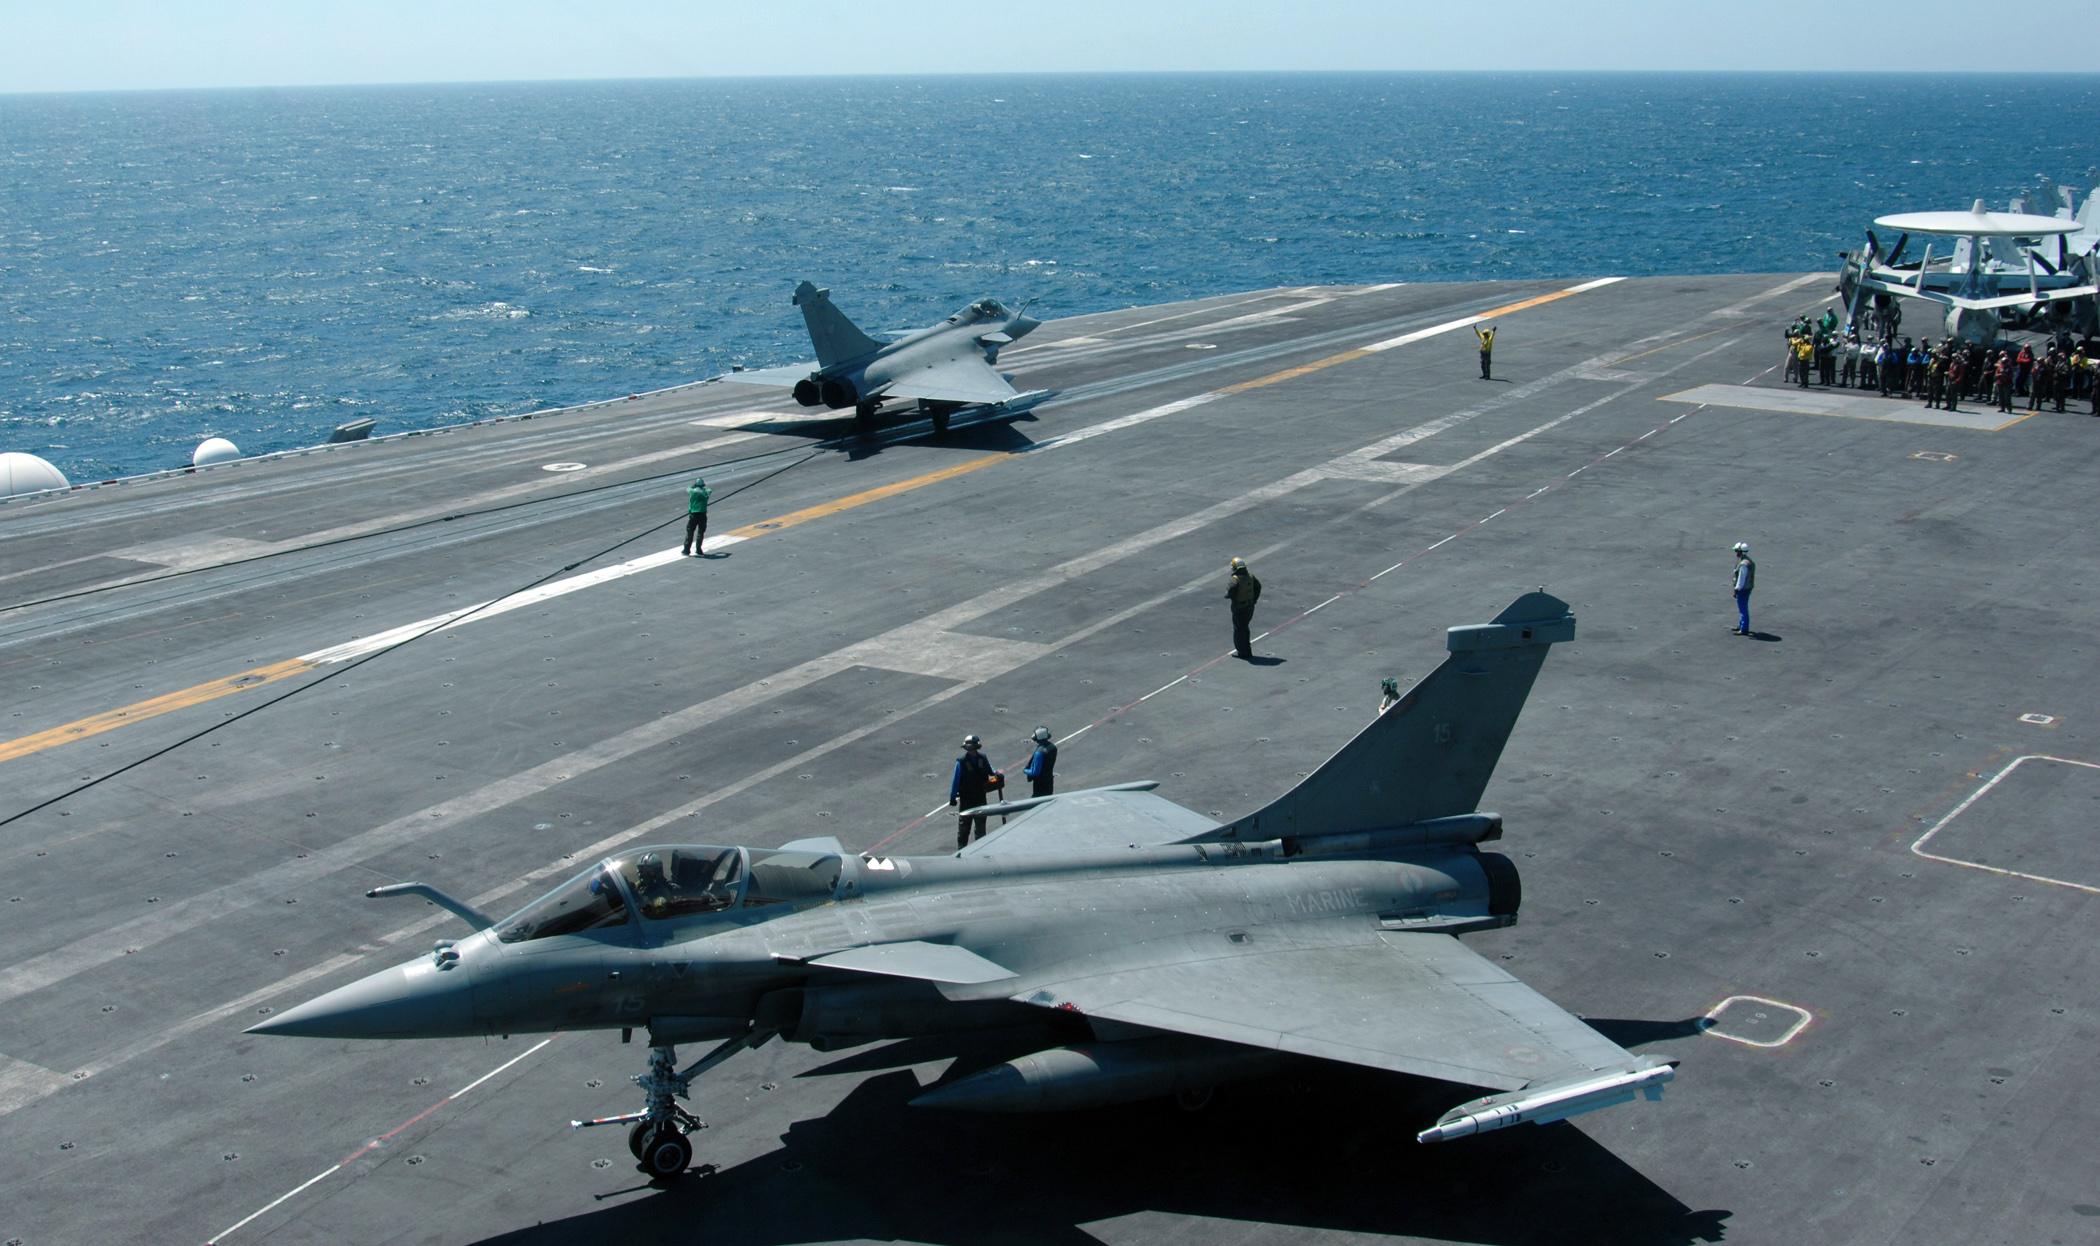 http://upload.wikimedia.org/wikipedia/commons/4/44/Rafales_aboard_USS_Harry_Truman.jpg